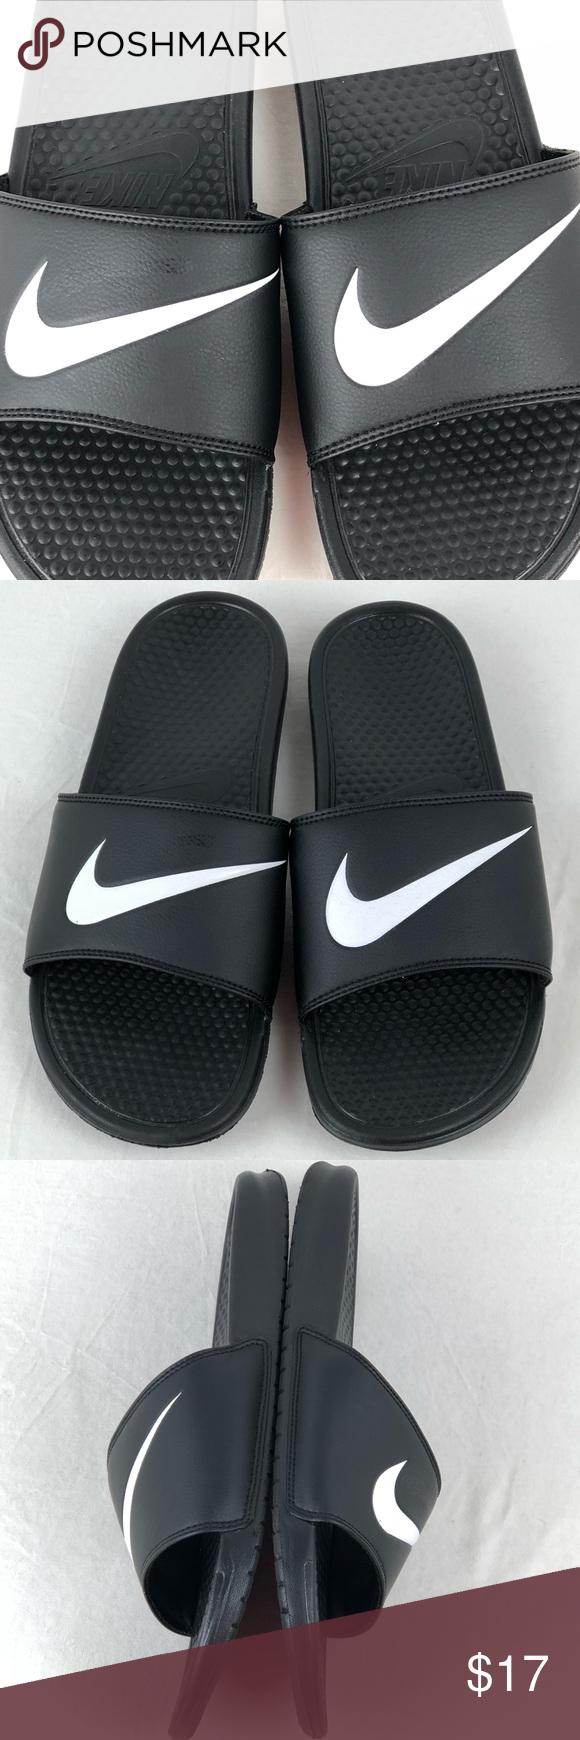 Fashionable Style Men Sandals High Discounts Nike Benassi